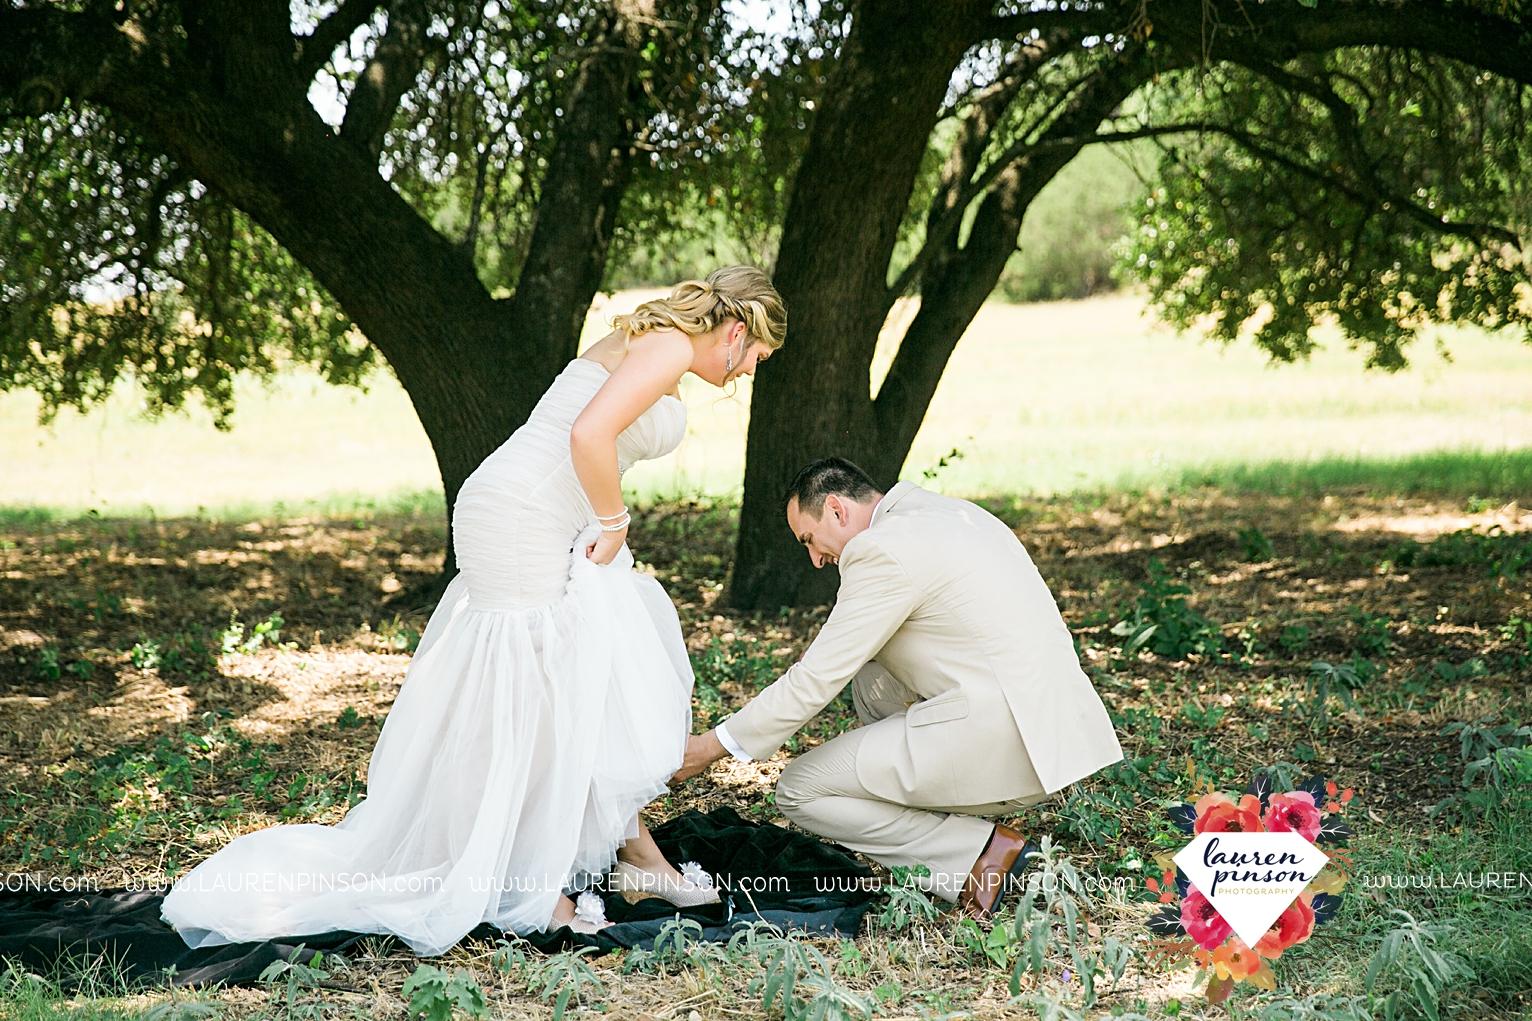 weatherford-texas-hollow-hill-farm-event-wedding-mineral-wells-dfw-wedding-photographer-wichita-falls-photography_3138.jpg